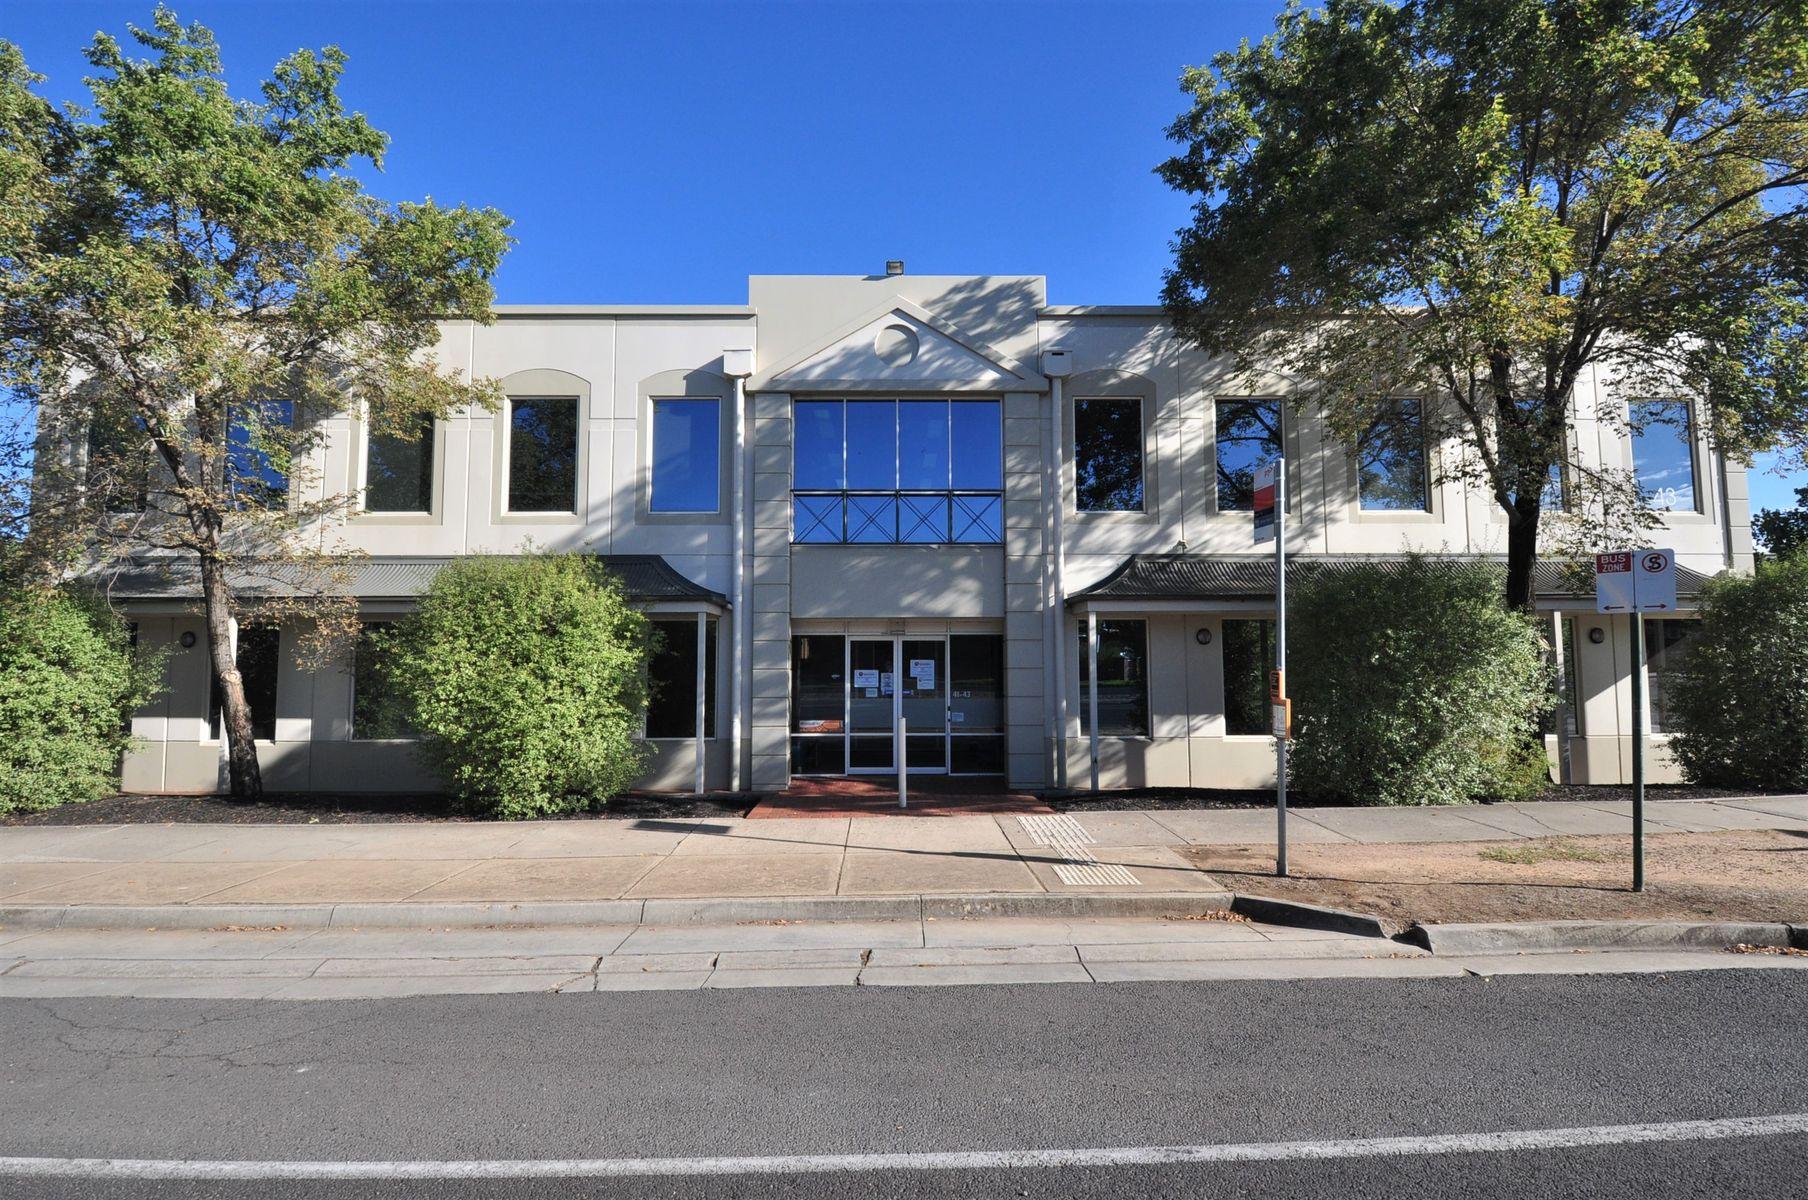 43 Myers Street, Bendigo, VIC 3550